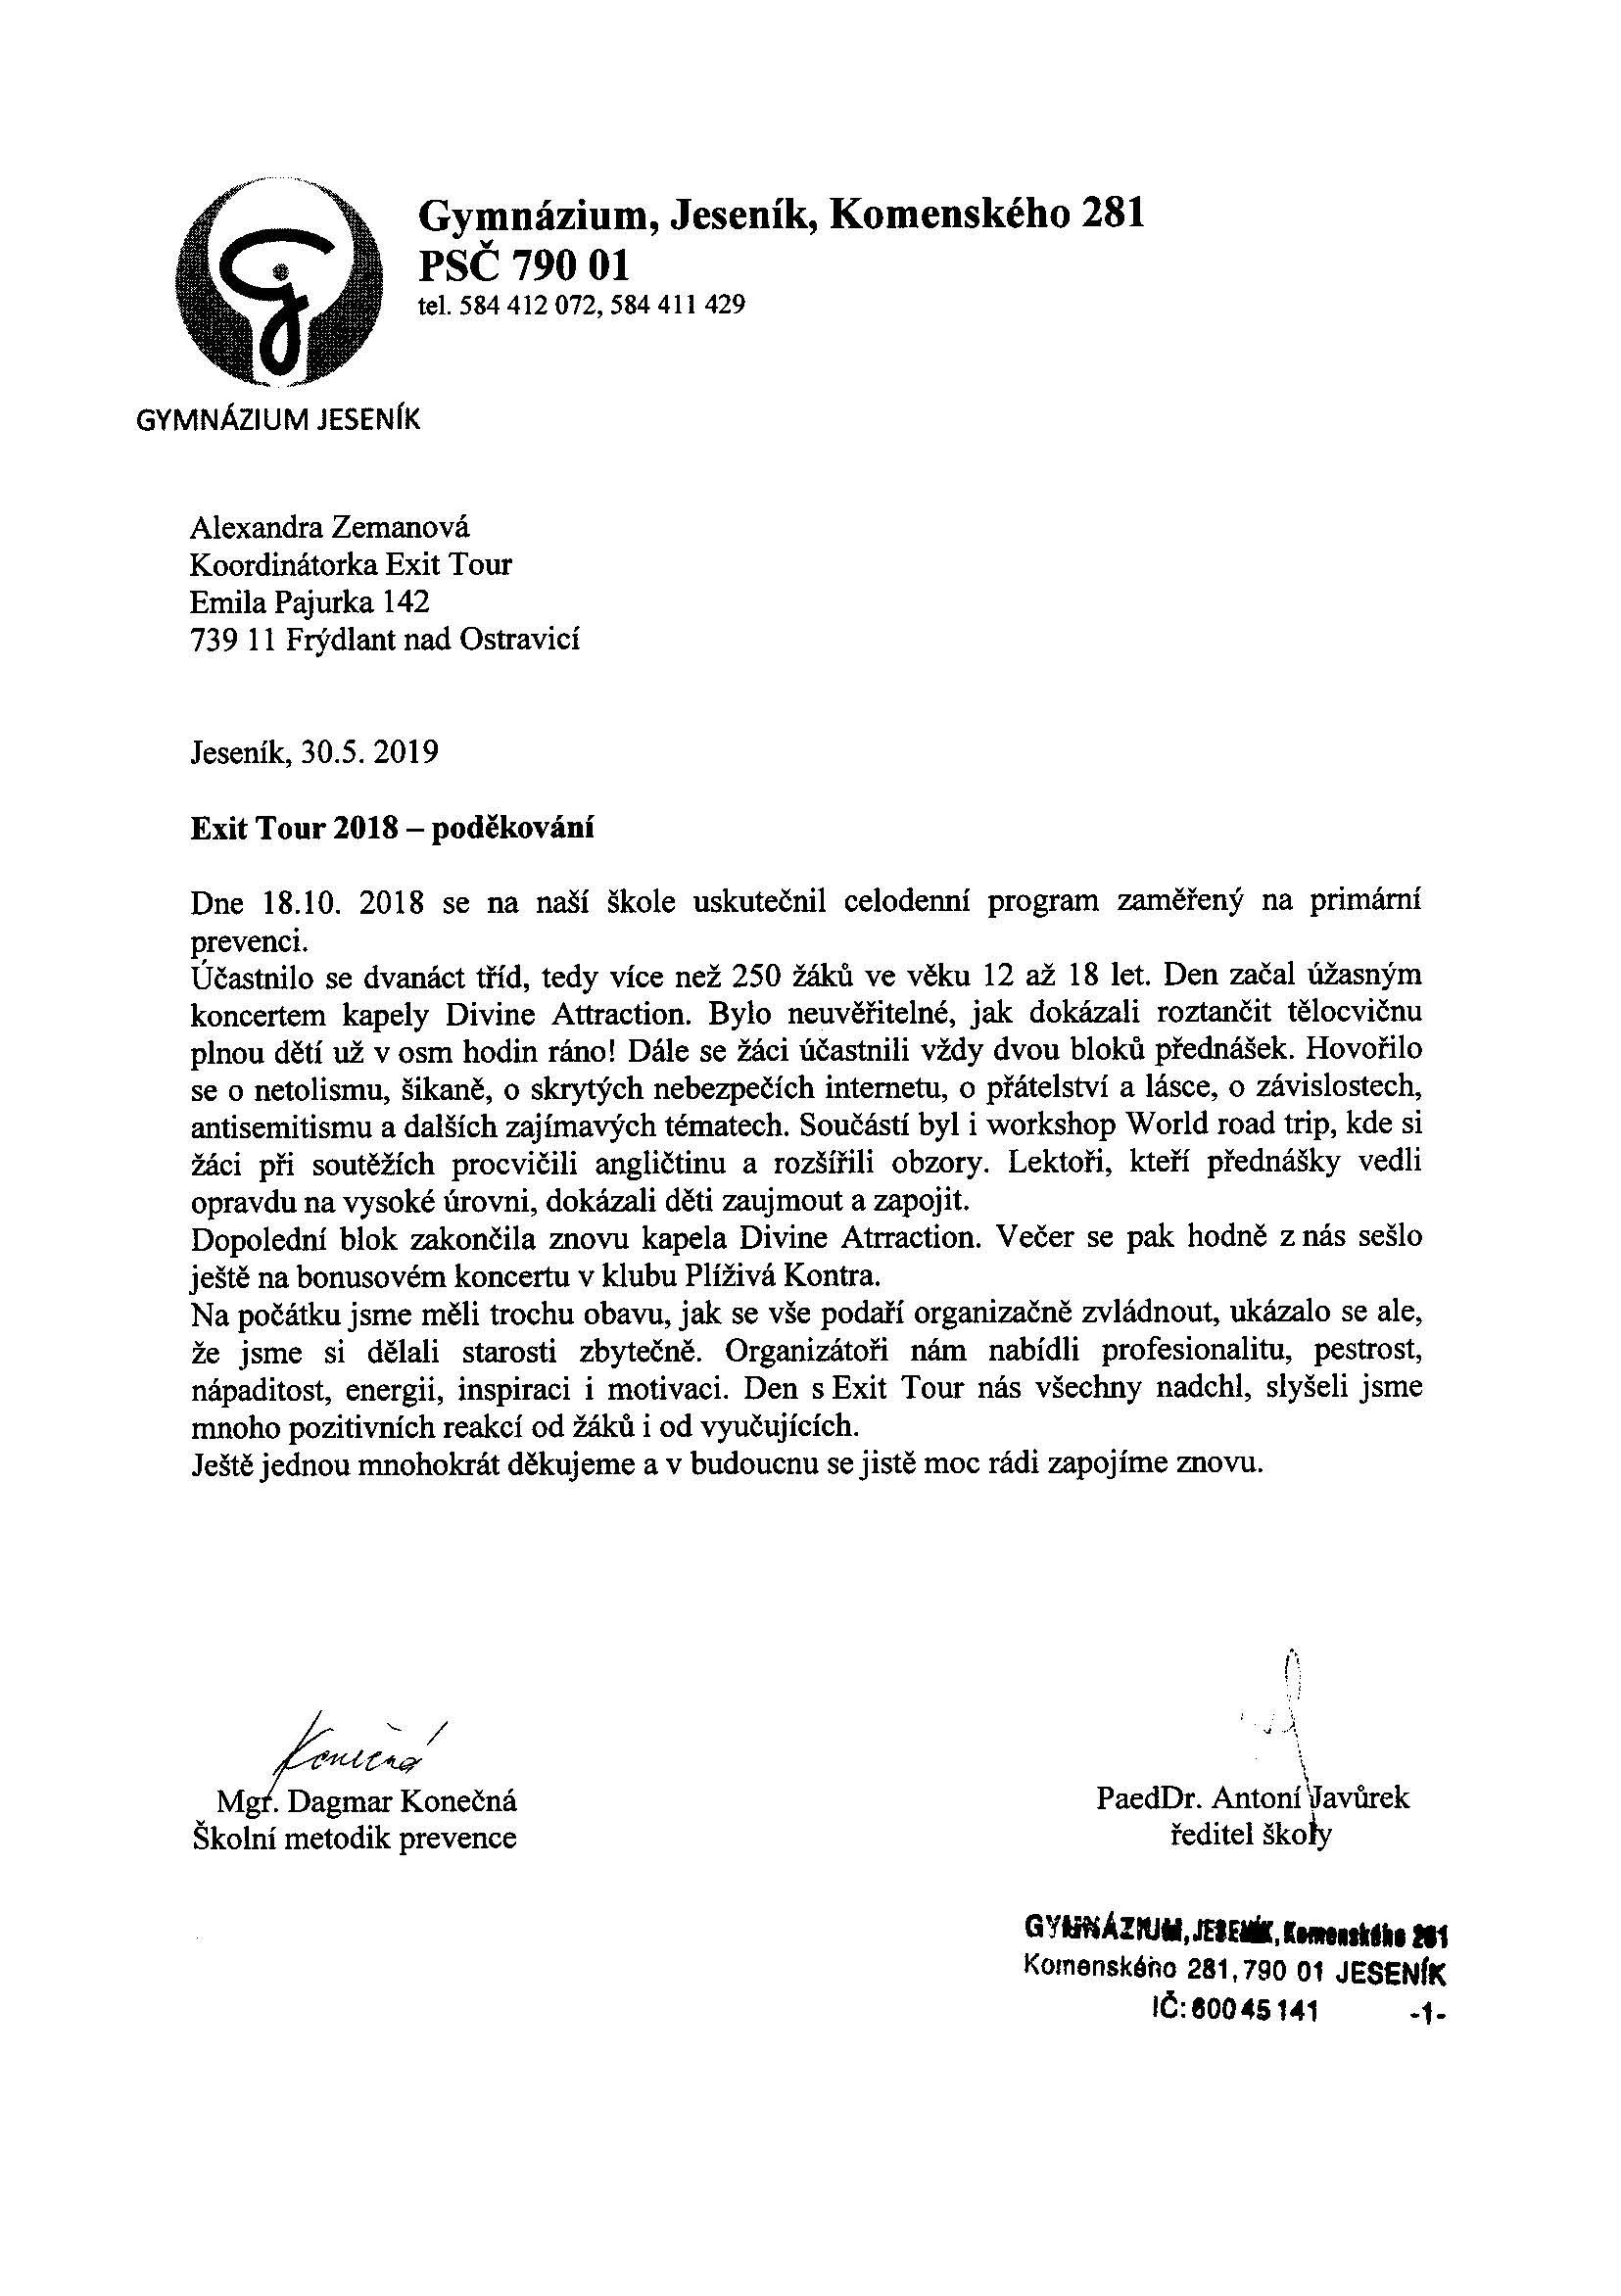 Gymnázium Komenského, JESENÍK.jpg